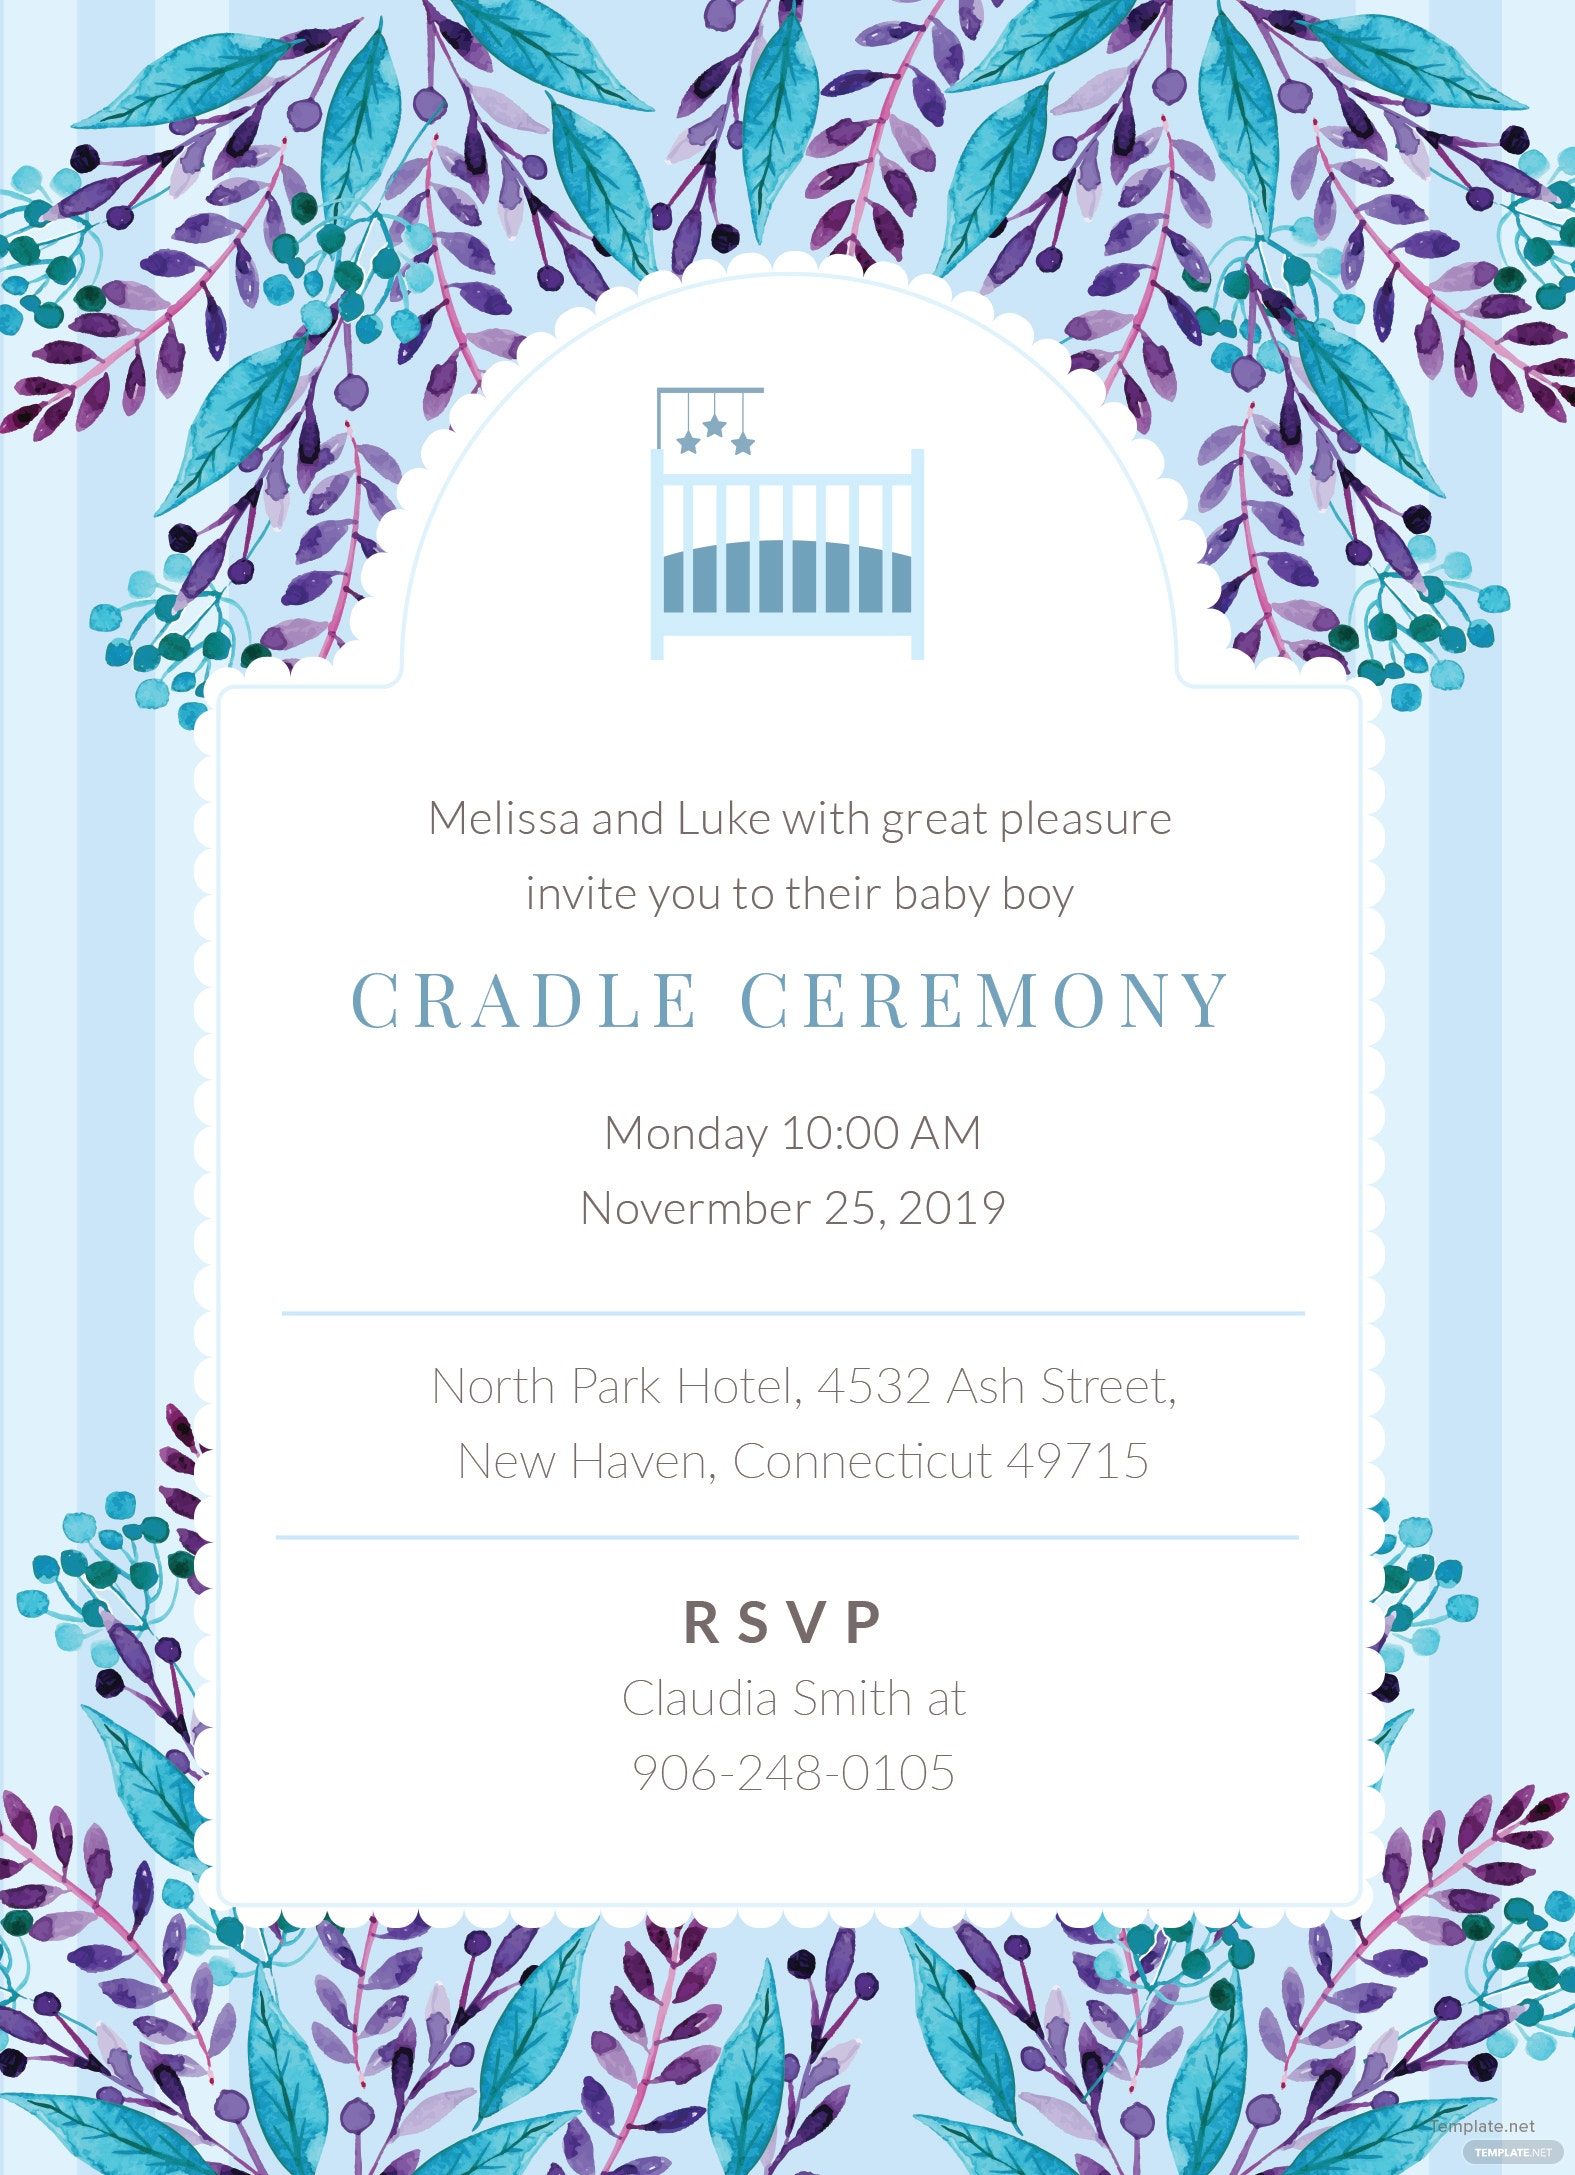 cradle ceremony invitation template in adobe illustrator